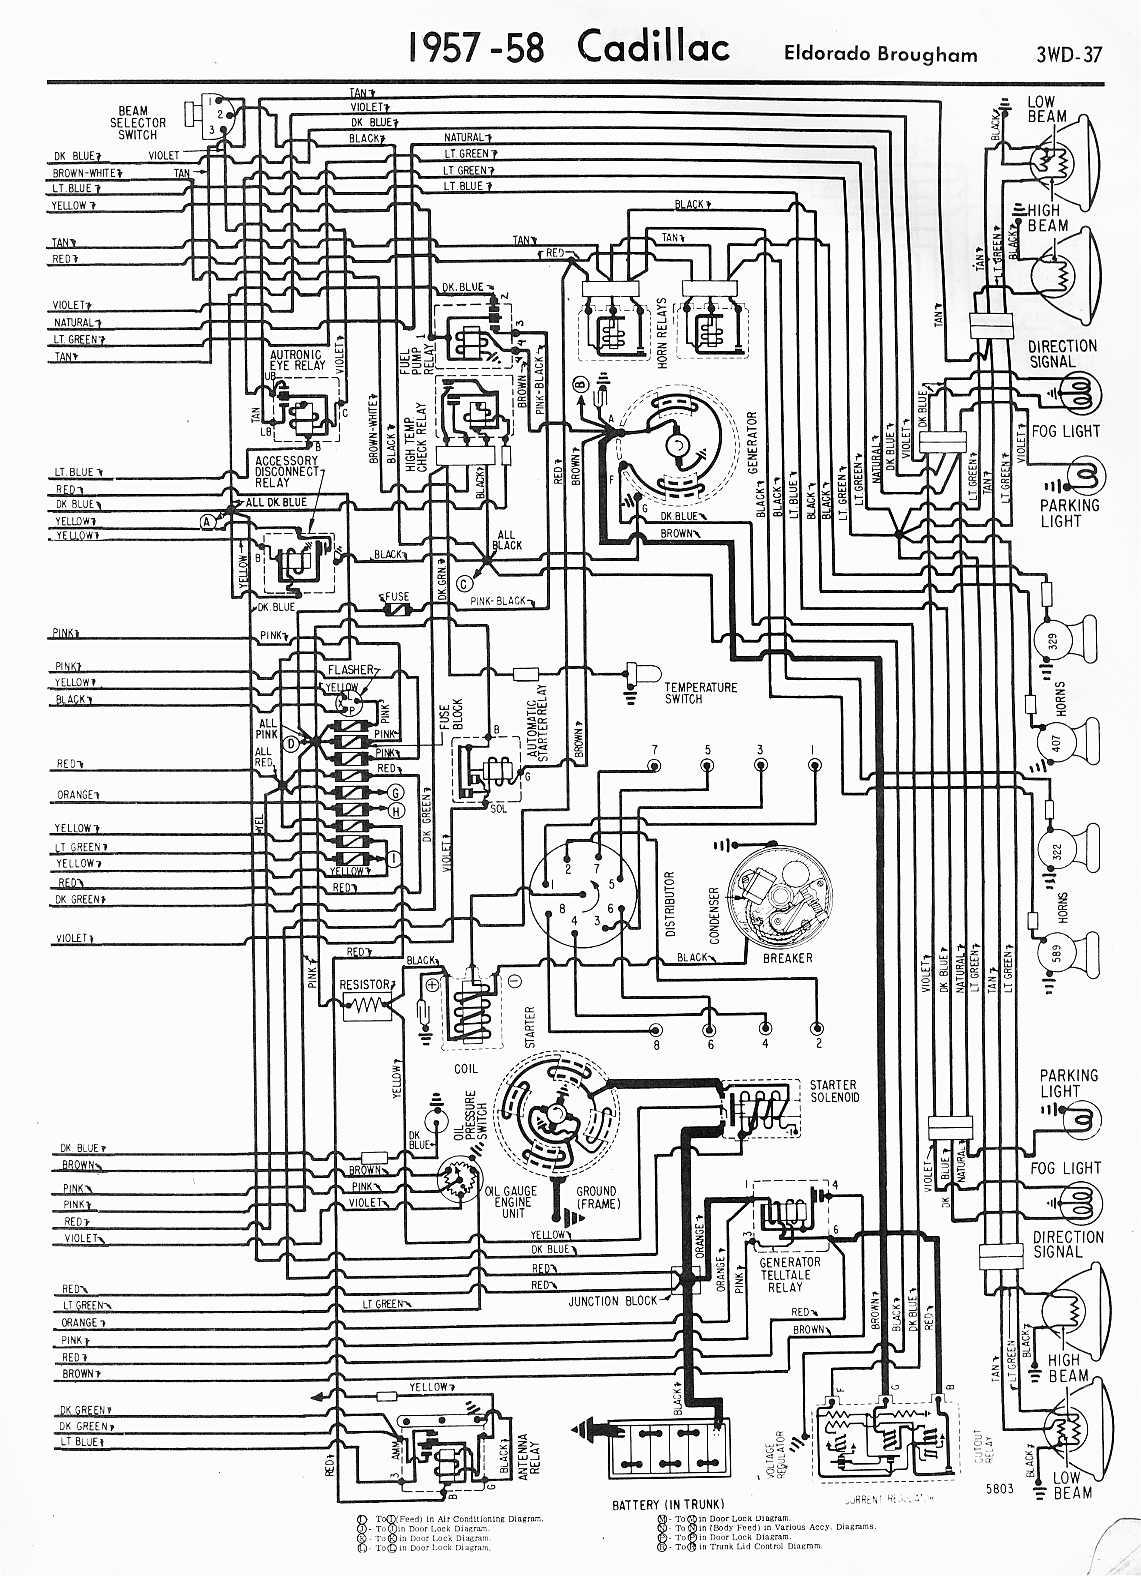 19571958 Cadillac Eldorado Brougham Wiring Diagram | All